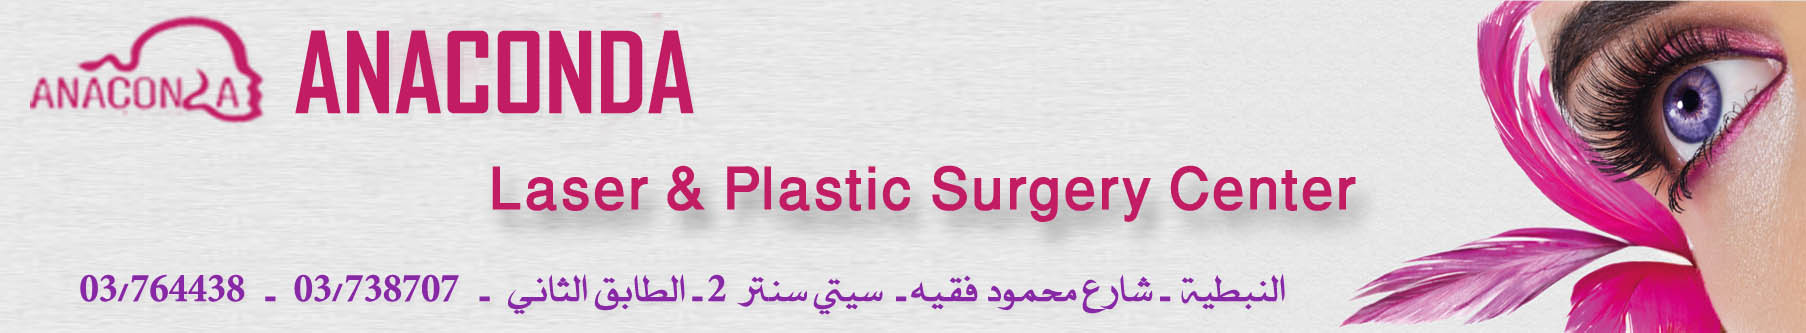 nabatieh.org/news.php?go=fullnews&newsid=9090